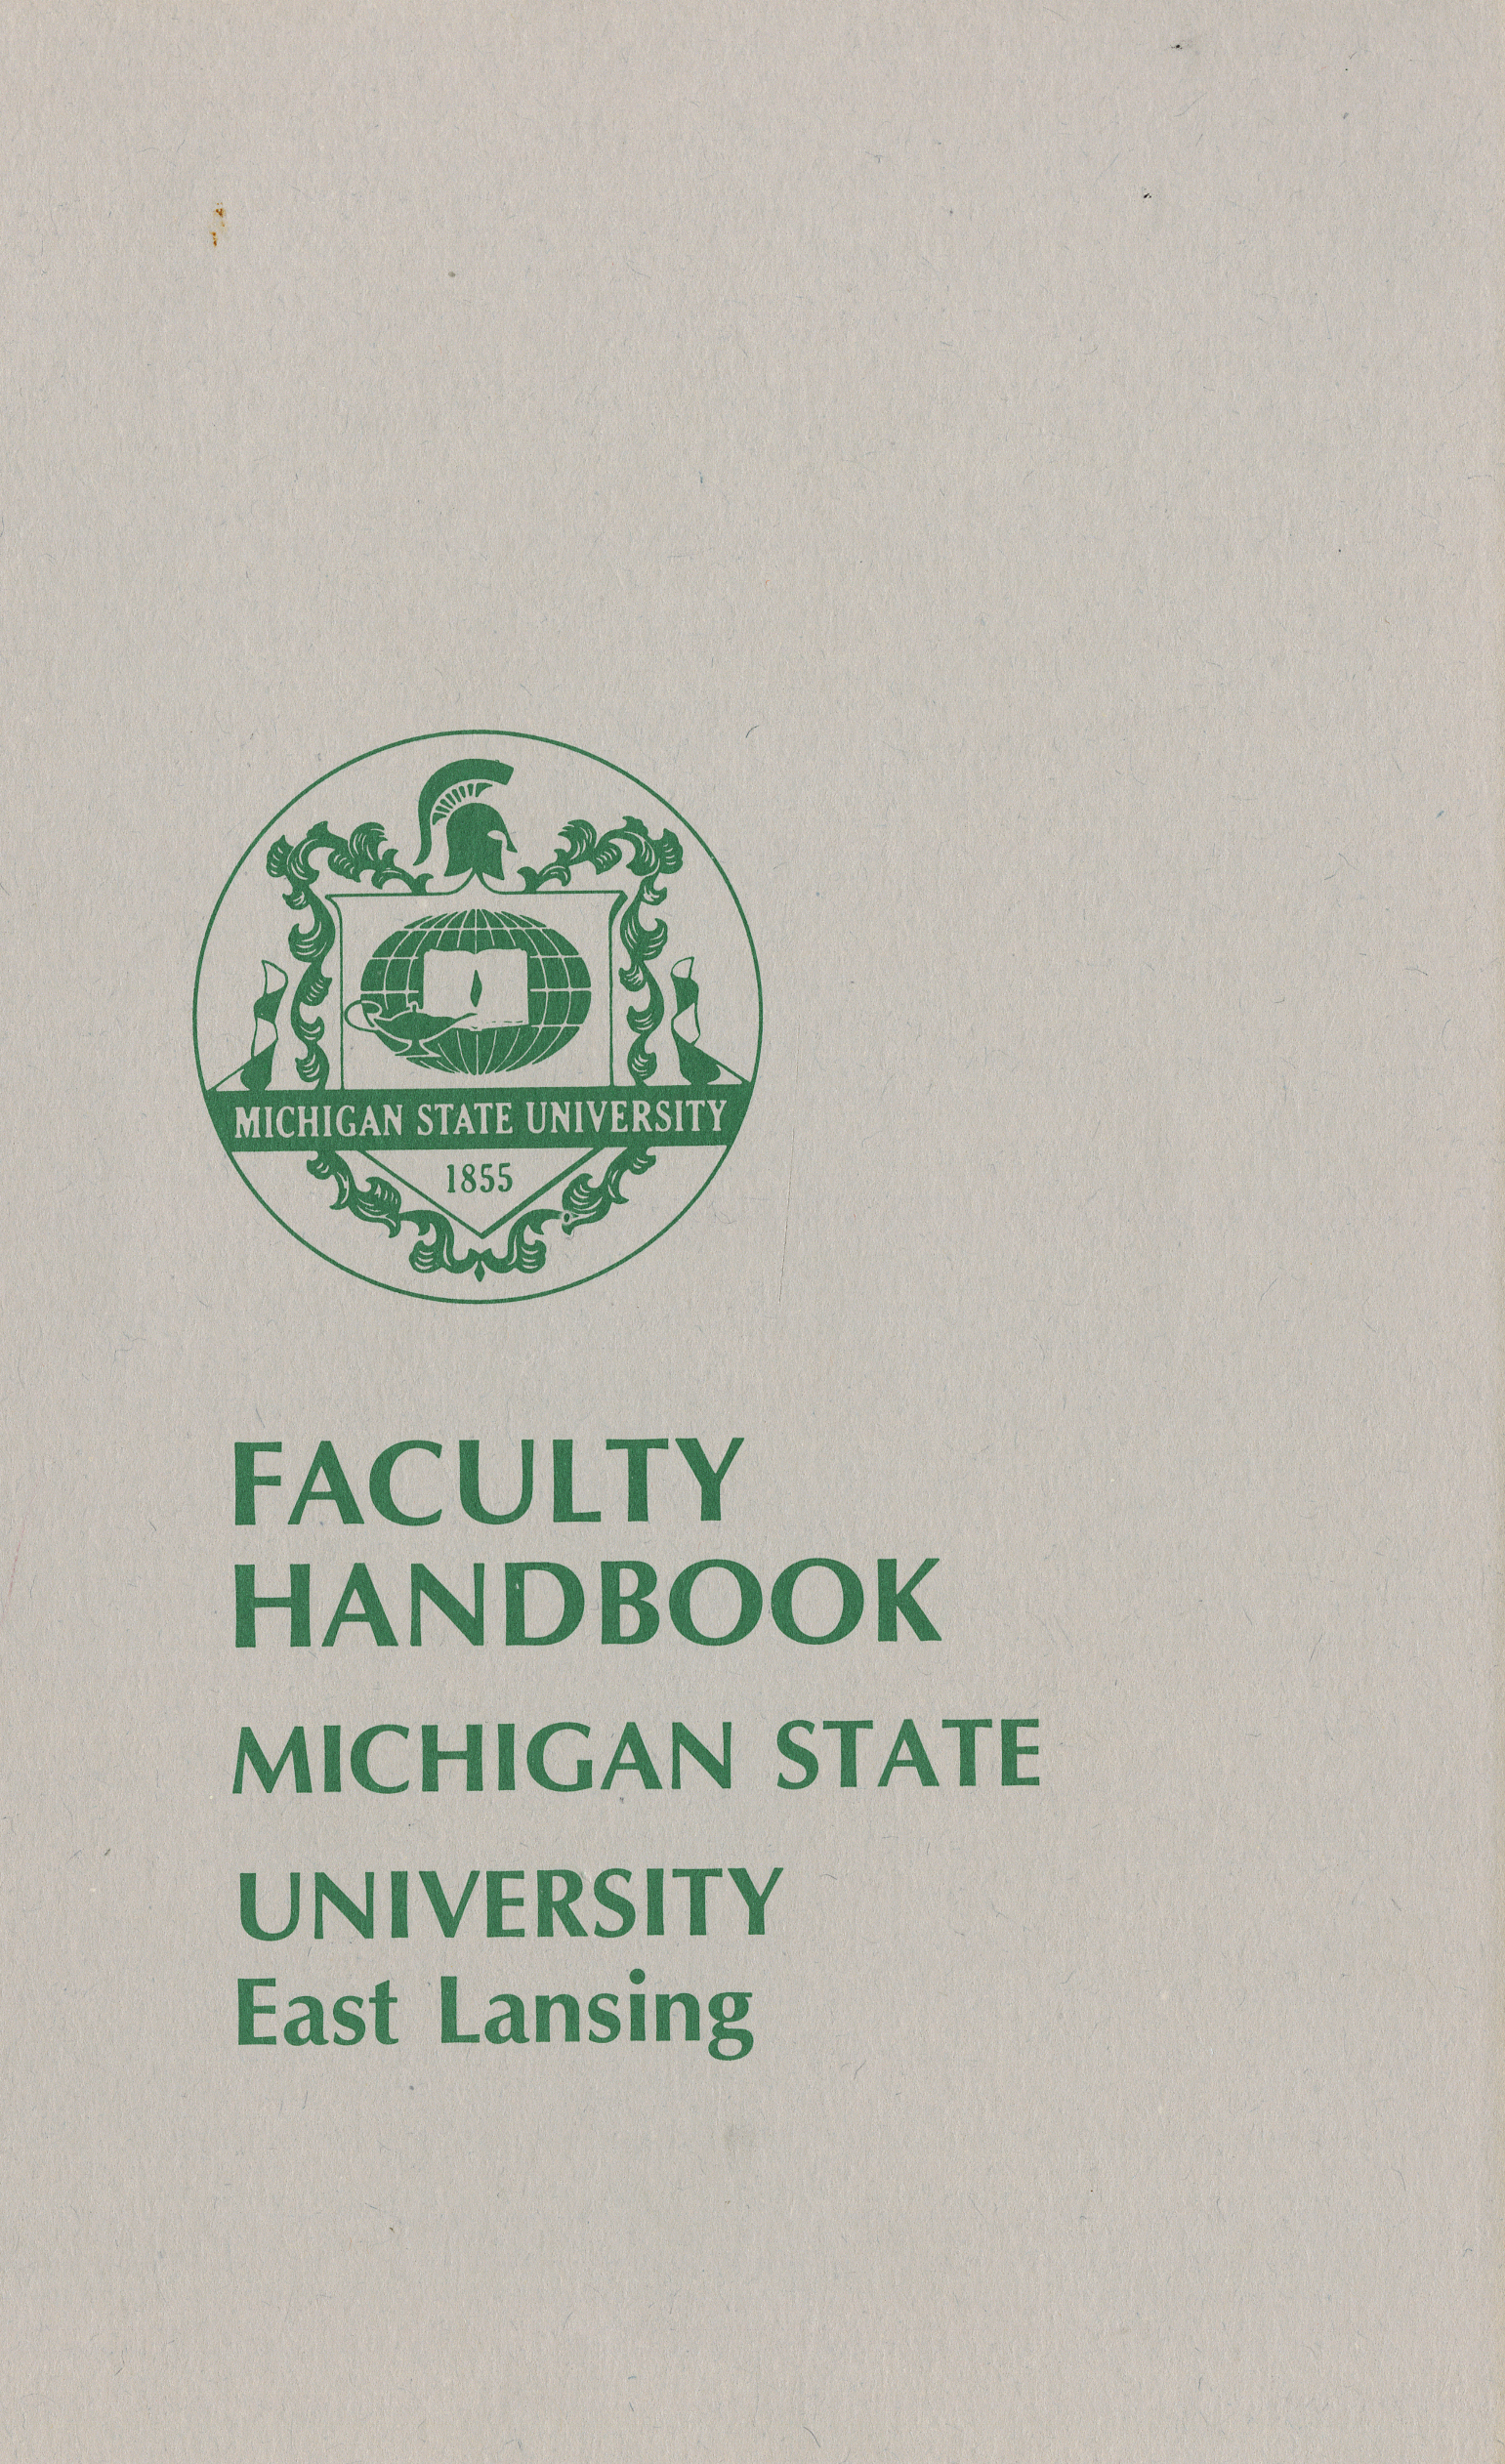 Faculty Handbooks, 1980-1989